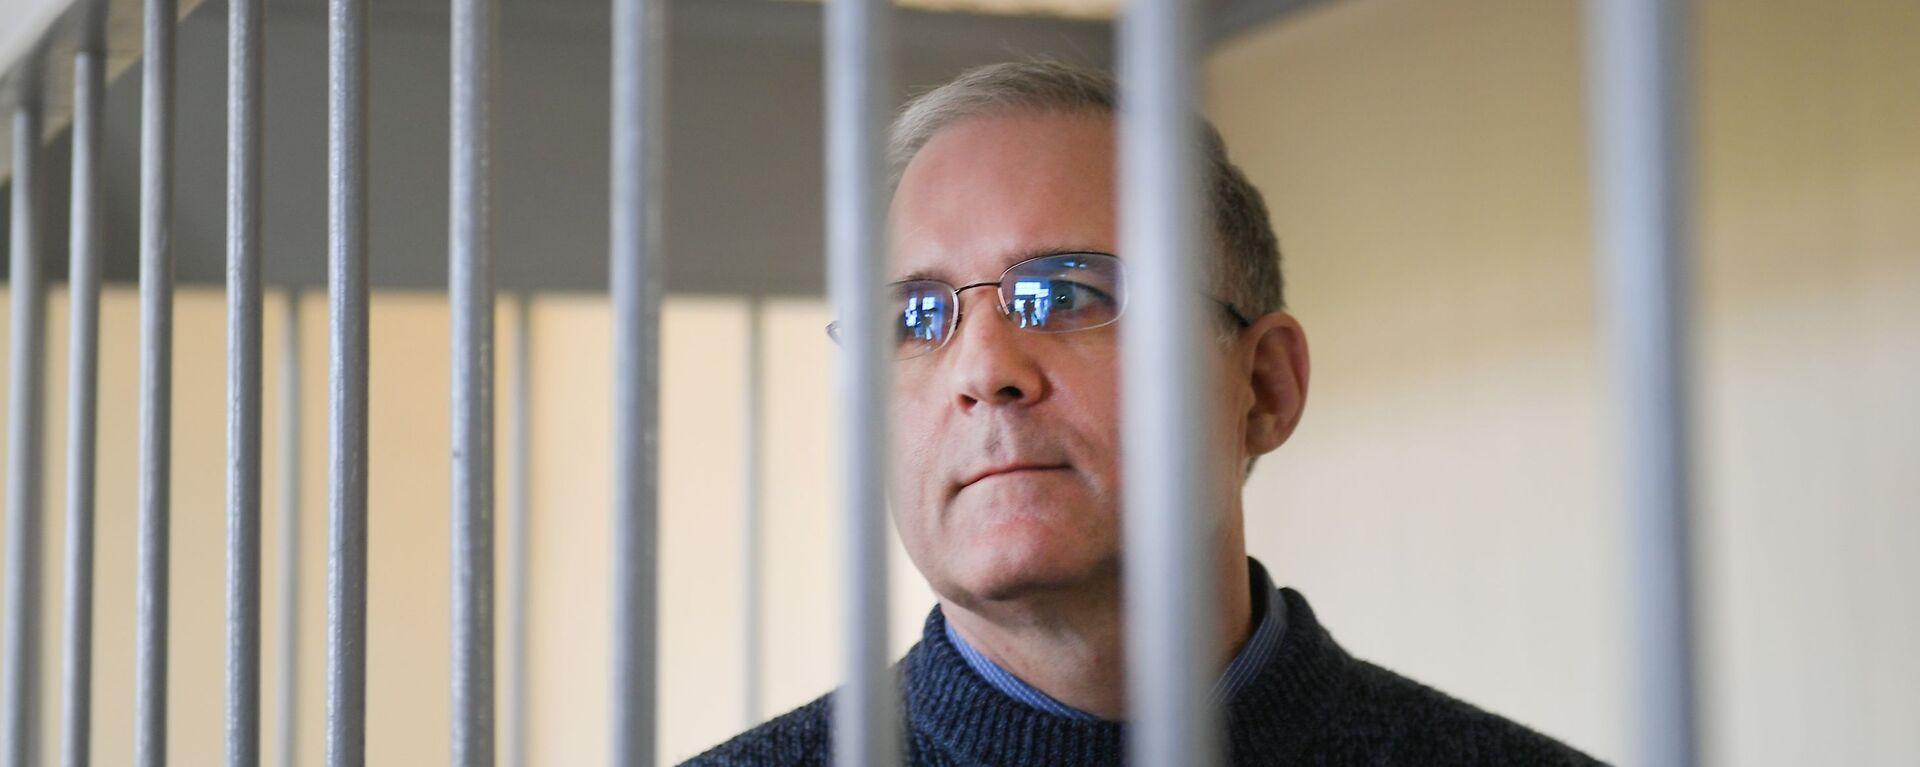 Paul Whelan, ciudadano estadounidense sentenciado en Rusia por espionaje - Sputnik Mundo, 1920, 16.02.2021